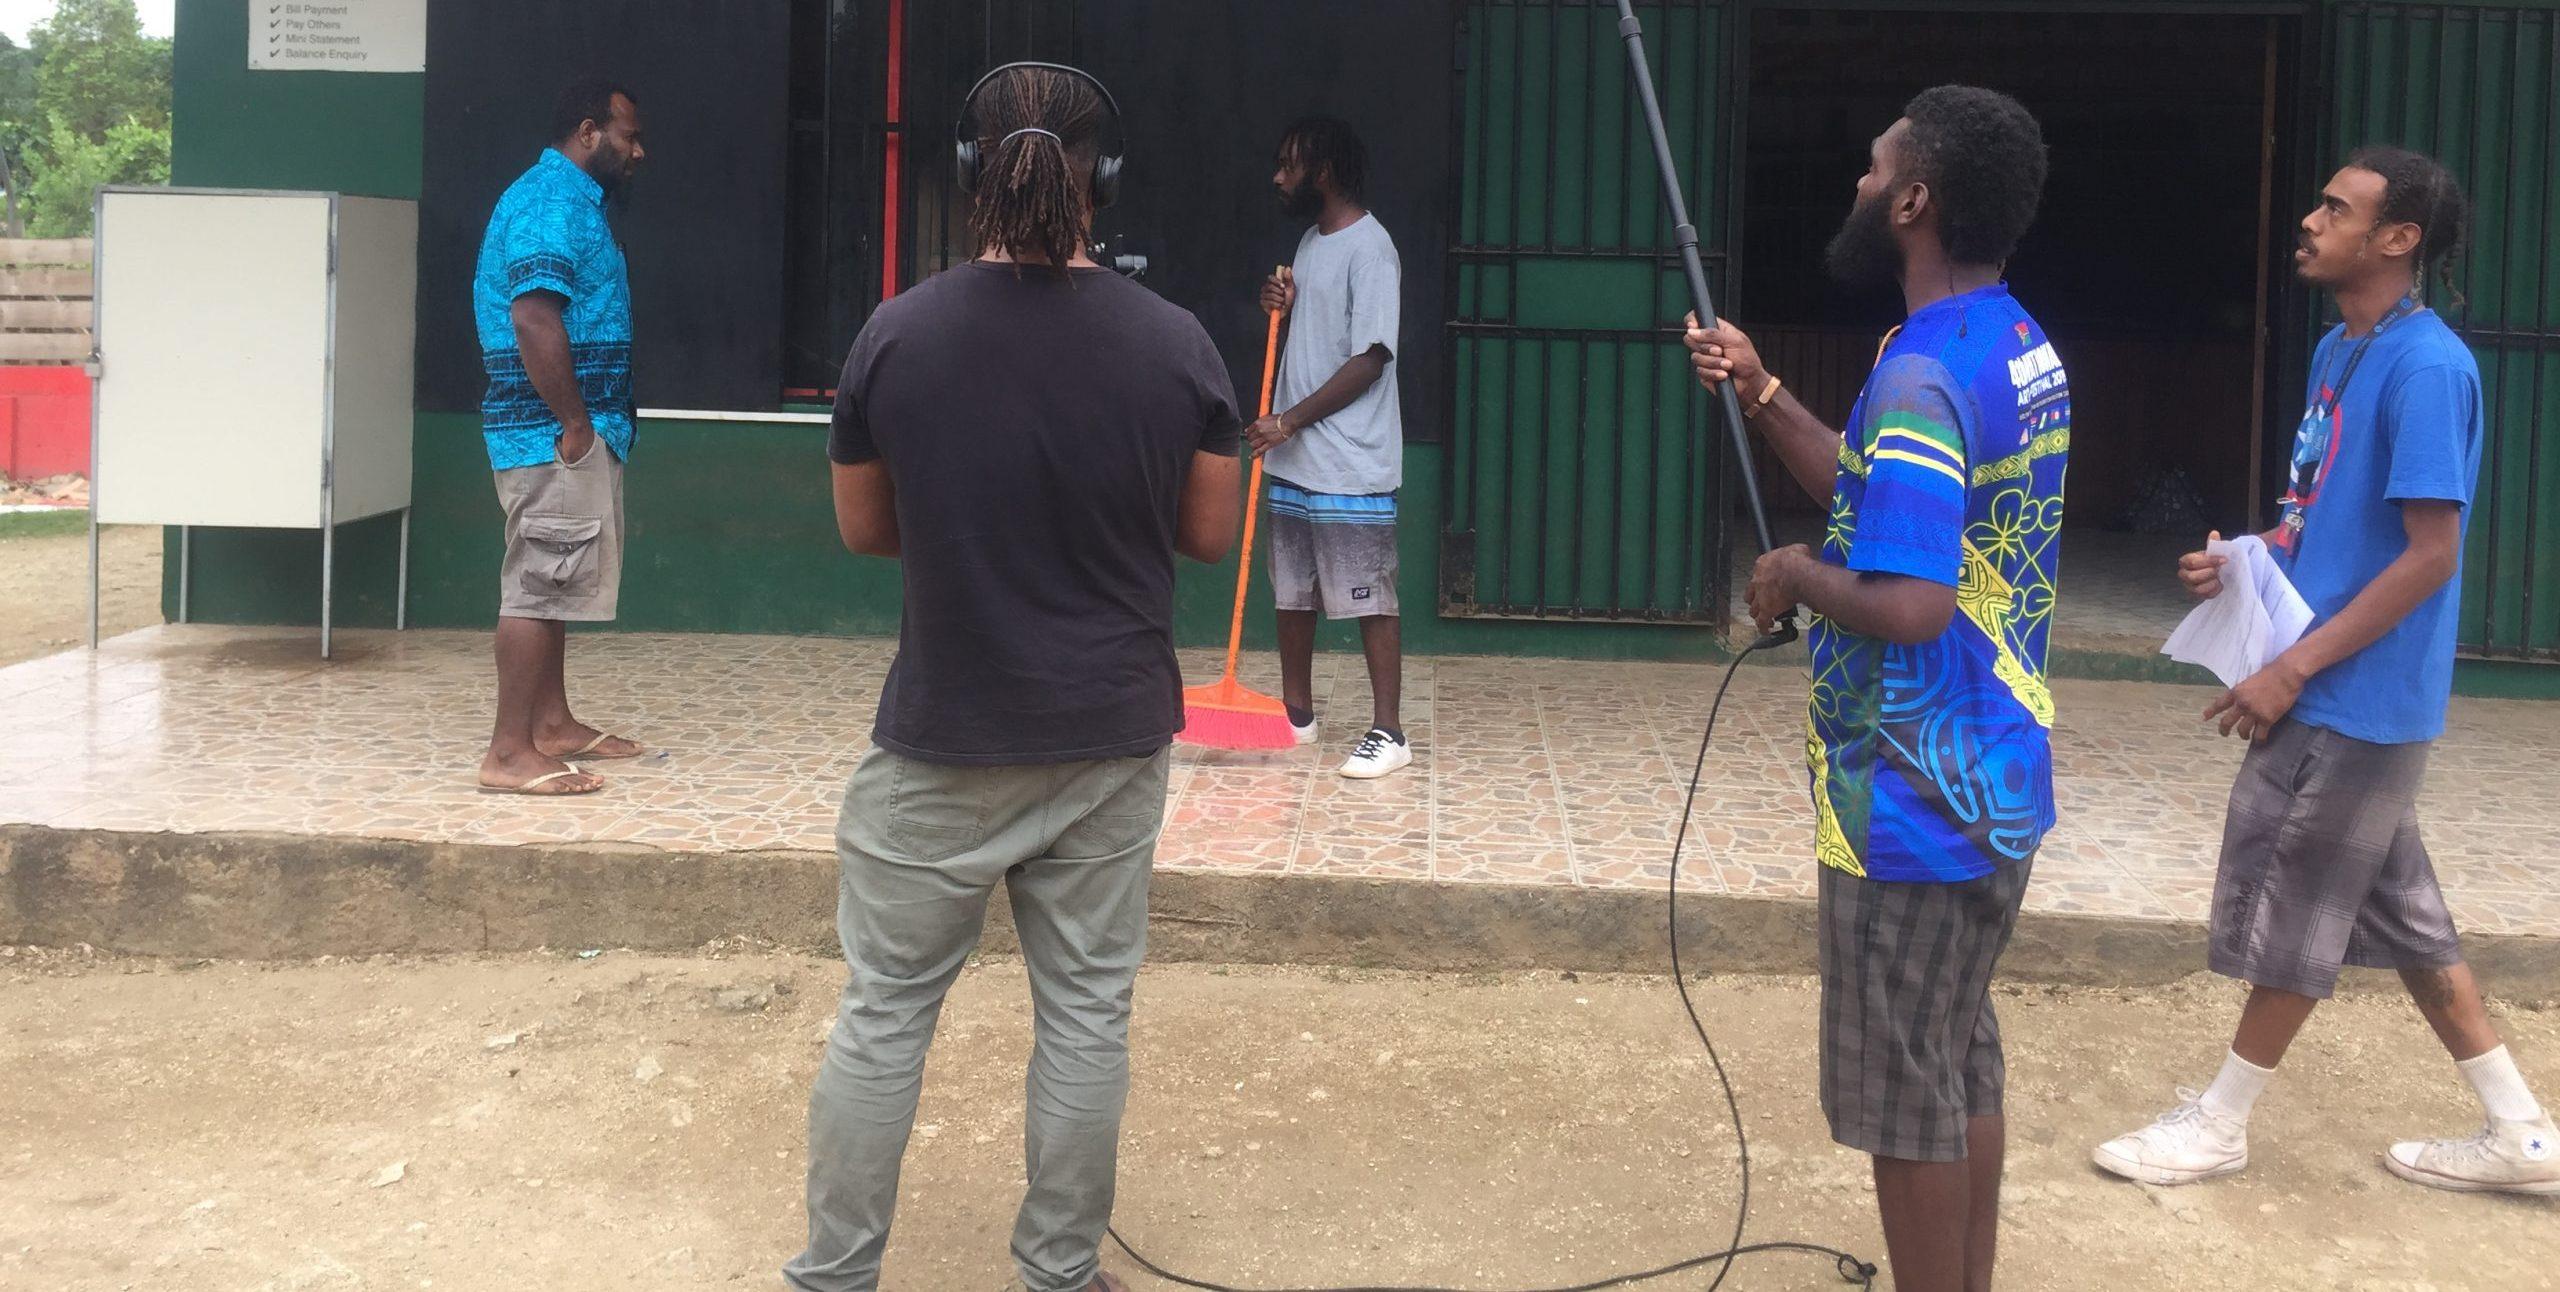 girls-online-safety-filming